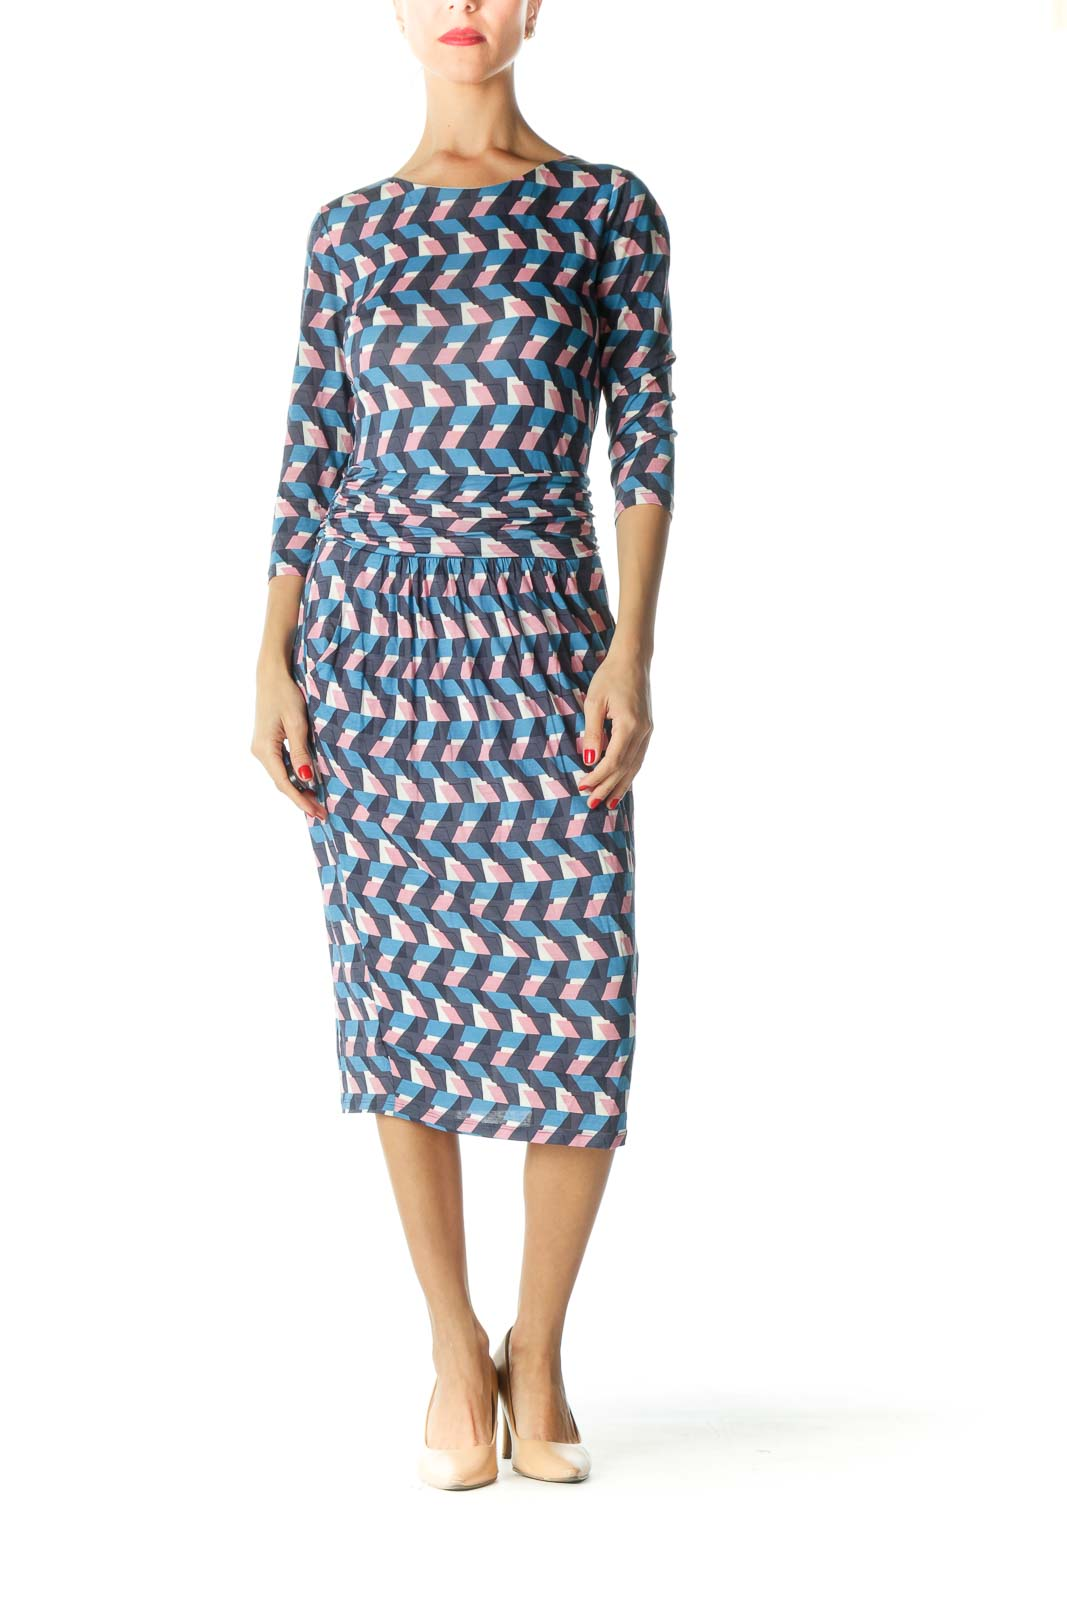 Blue Pink White 3/4 Sleeve Print Day Dress